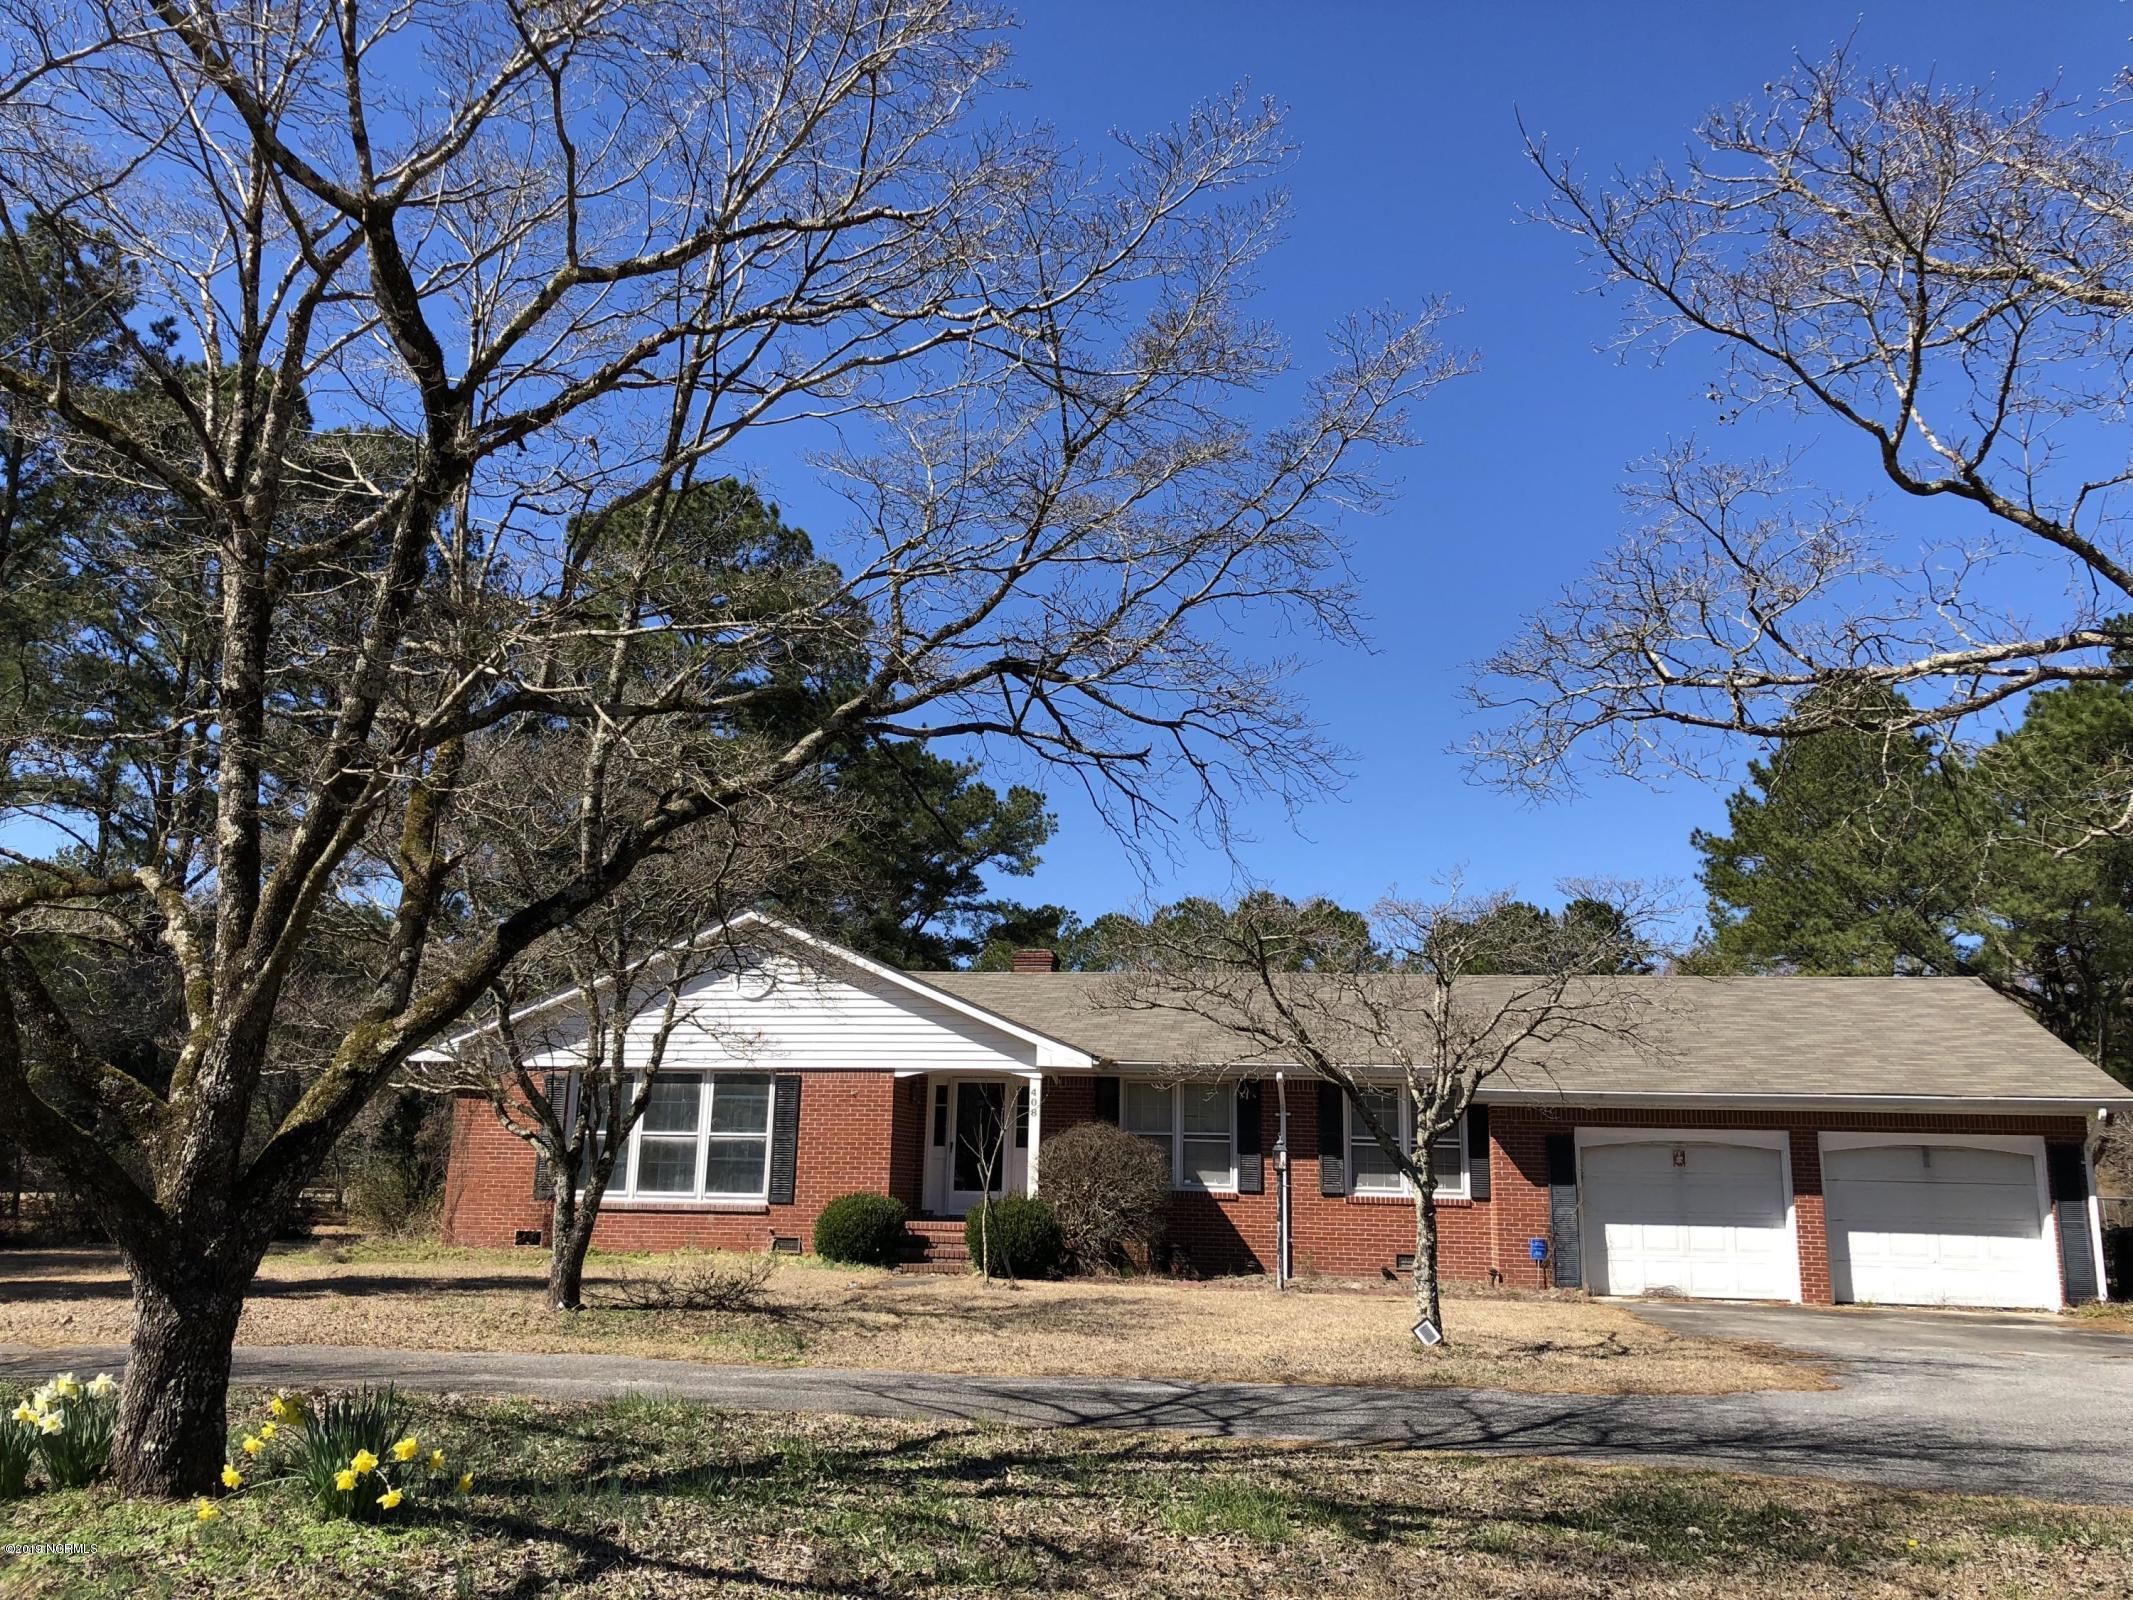 408 Tranters Creek Road, Washington, North Carolina 27889, 3 Bedrooms Bedrooms, 7 Rooms Rooms,2 BathroomsBathrooms,Single family residence,For sale,Tranters Creek,100180134